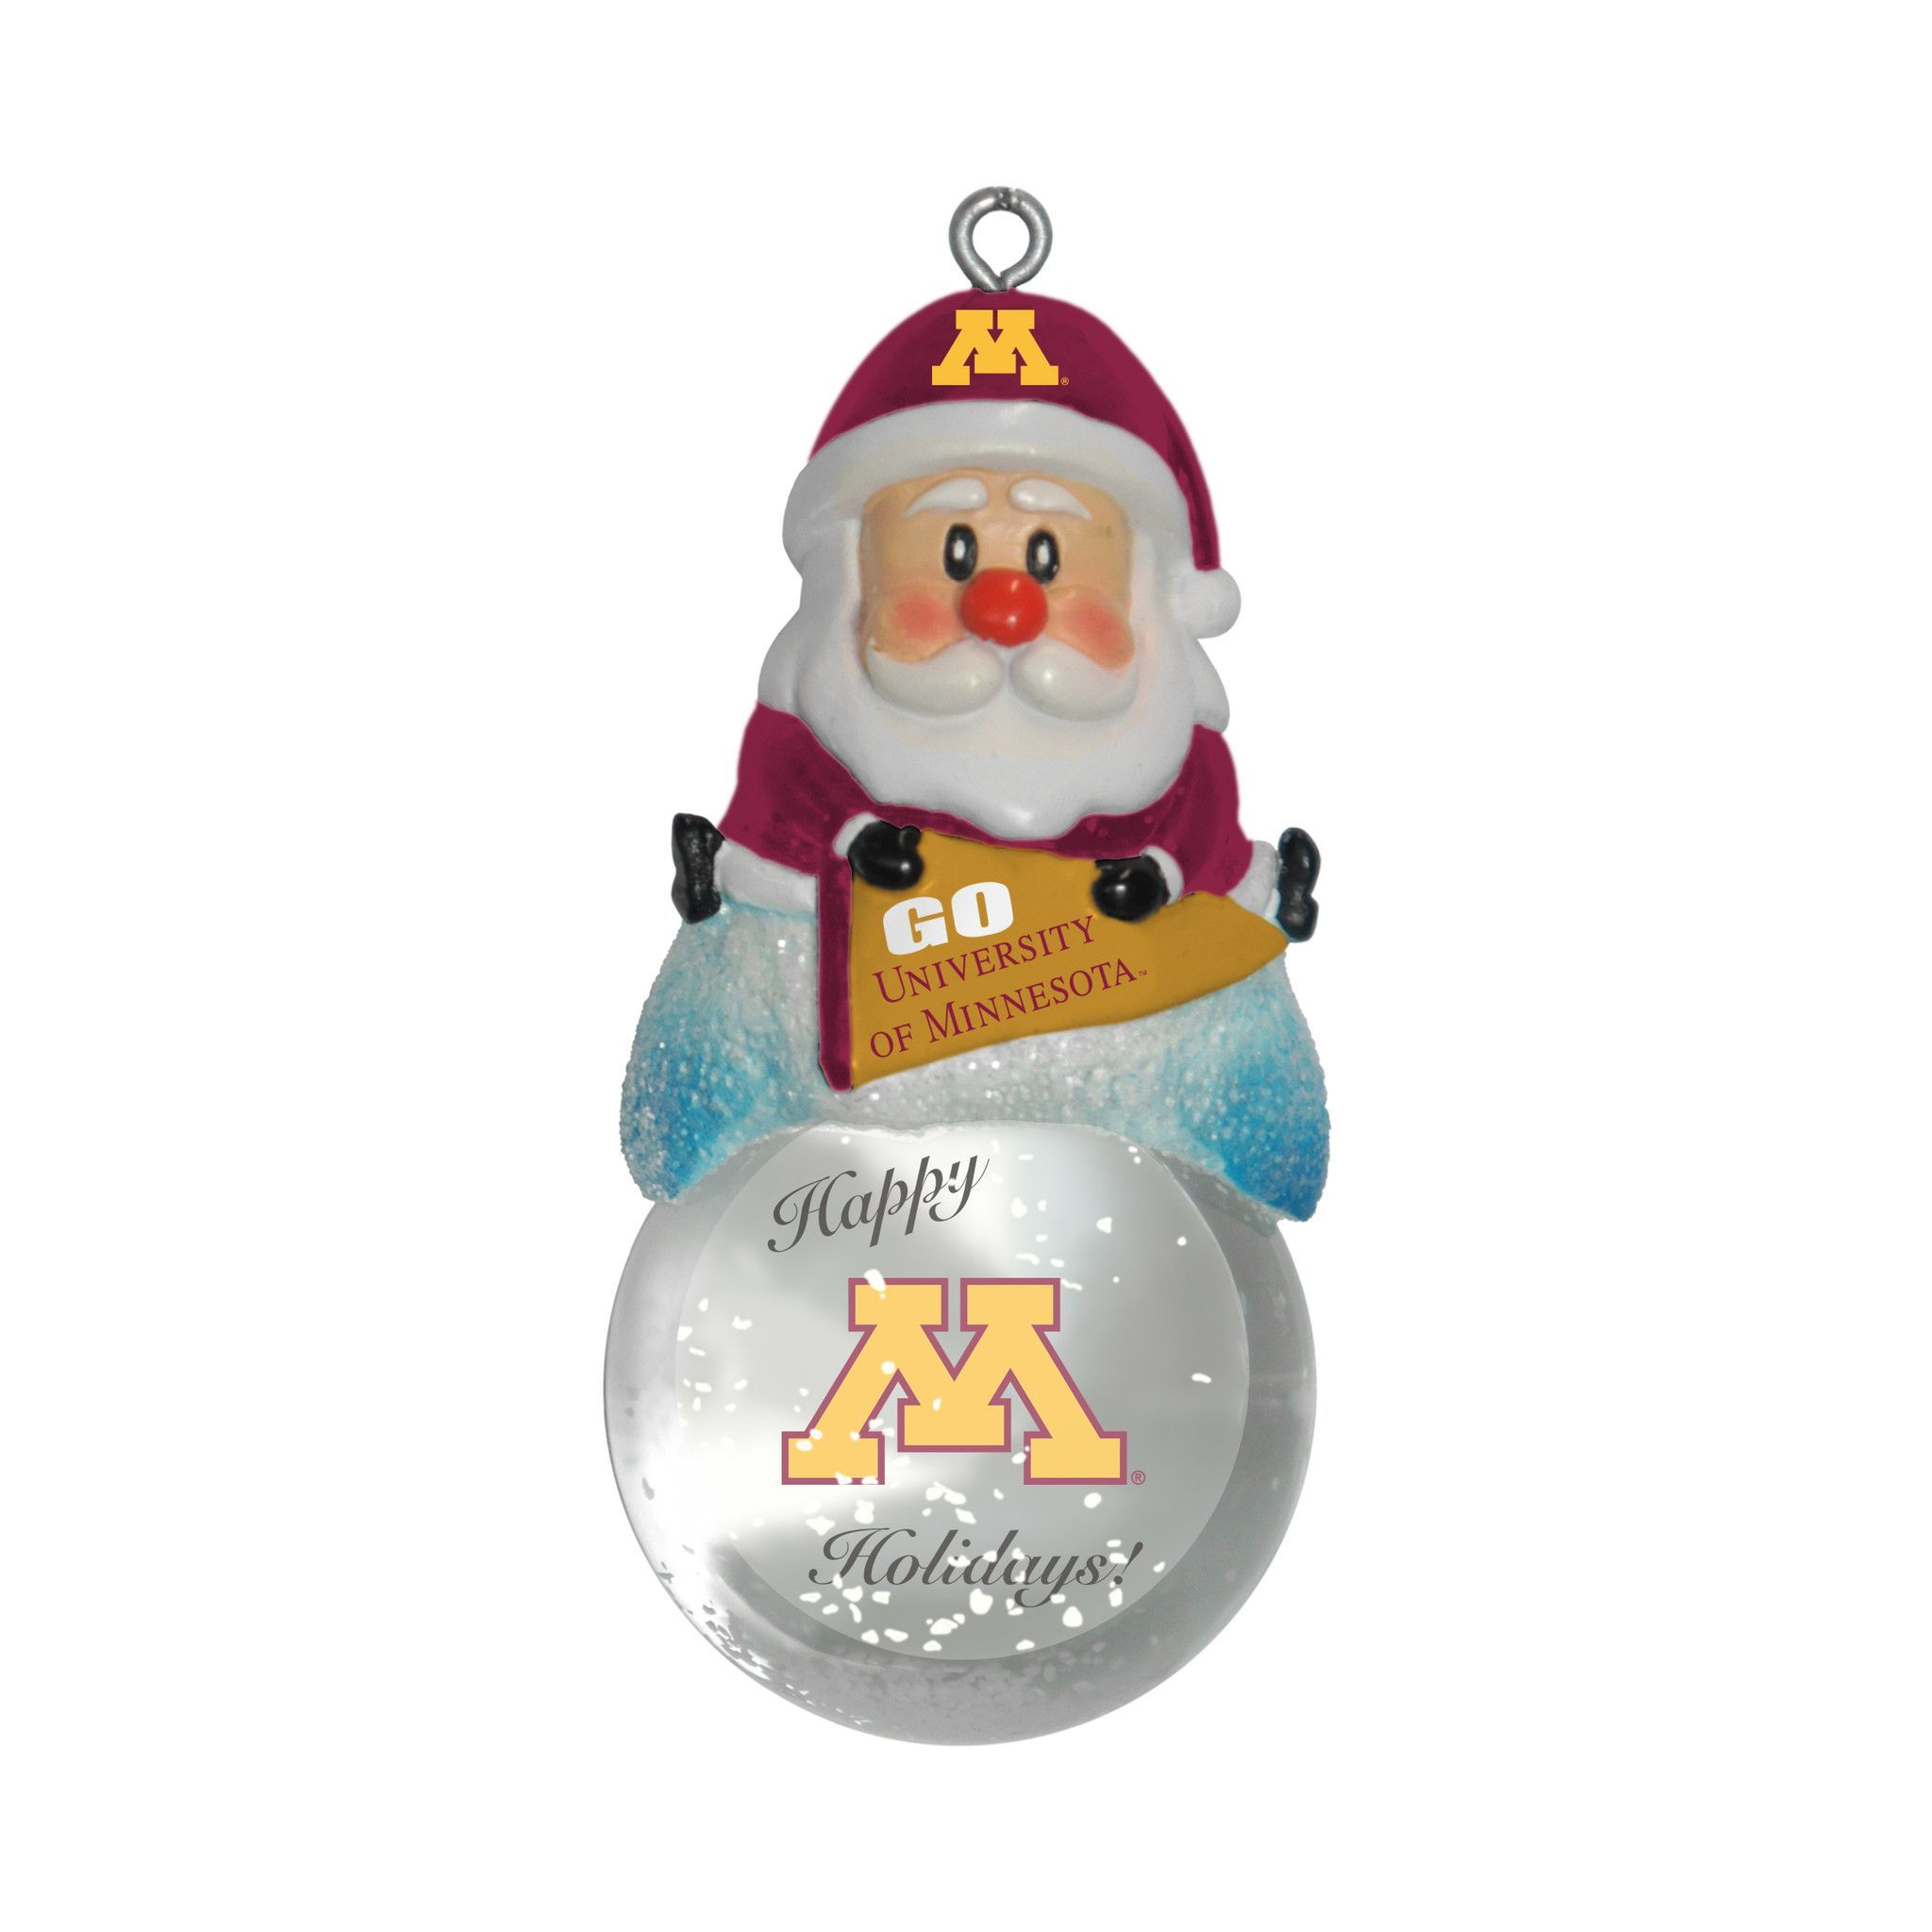 Minnesota Golden Gophers Ornament - Santa Snow Globe